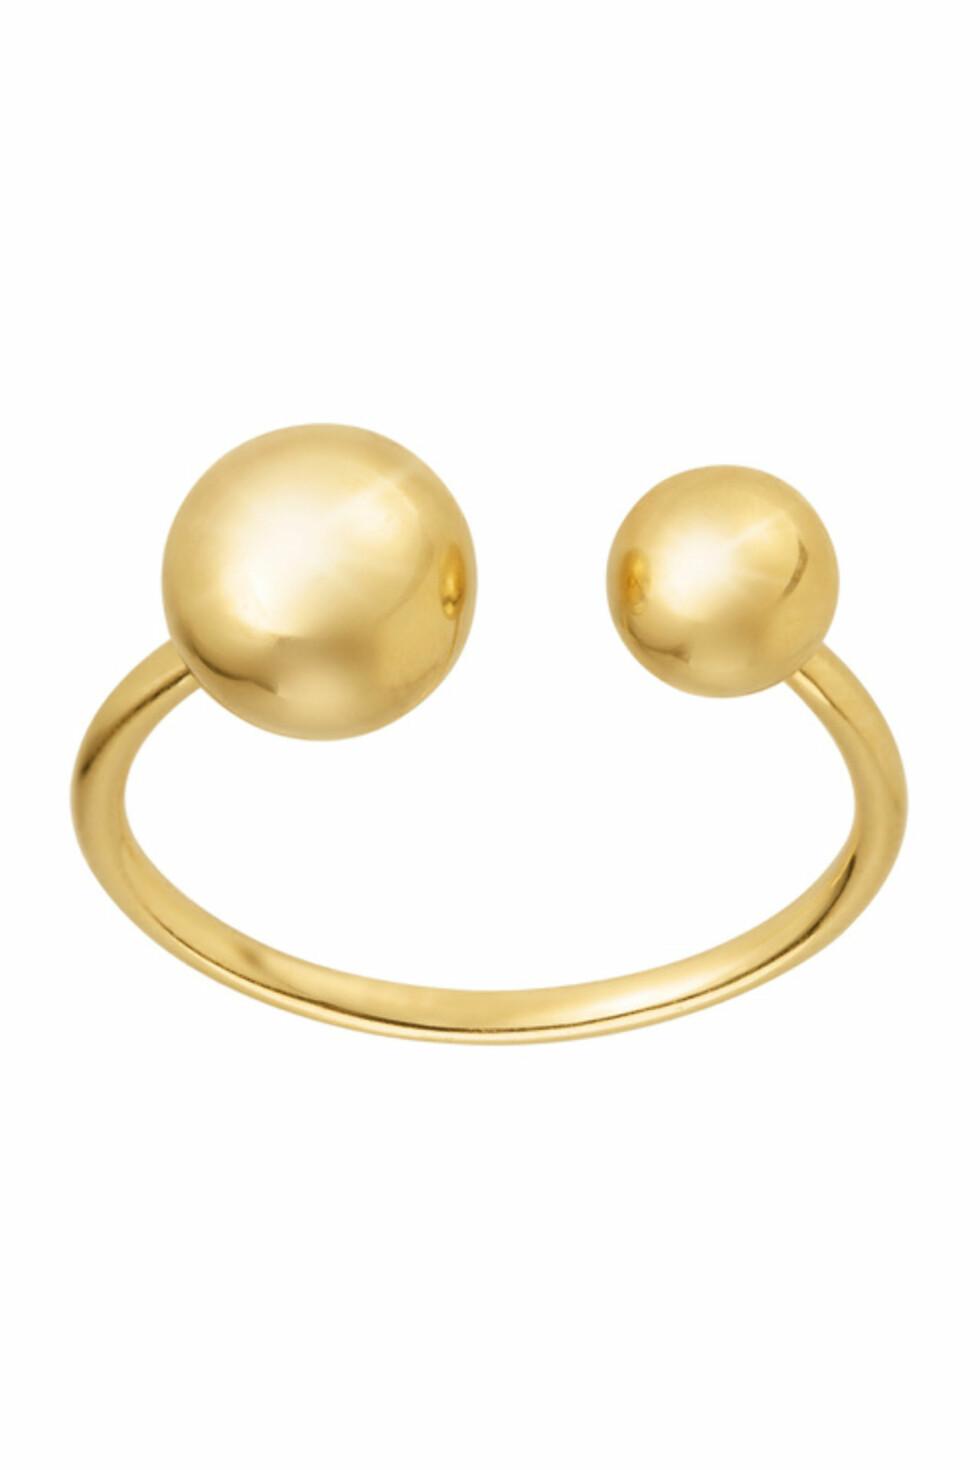 Ring fra Sophie by Sophie via Ellos.no | kr 790 | https://track.adtraction.com/t/t?a=1068408670&as=1115634940&t=2&tk=1&url=http://www.ellos.no/sophie-by-sophie/ring-two-planet/558744?N=1z141puZ1z141riZ1z141od&Ns=RankValue3|1&Nao=38&selArt=273829&pr=0C1B2S3T